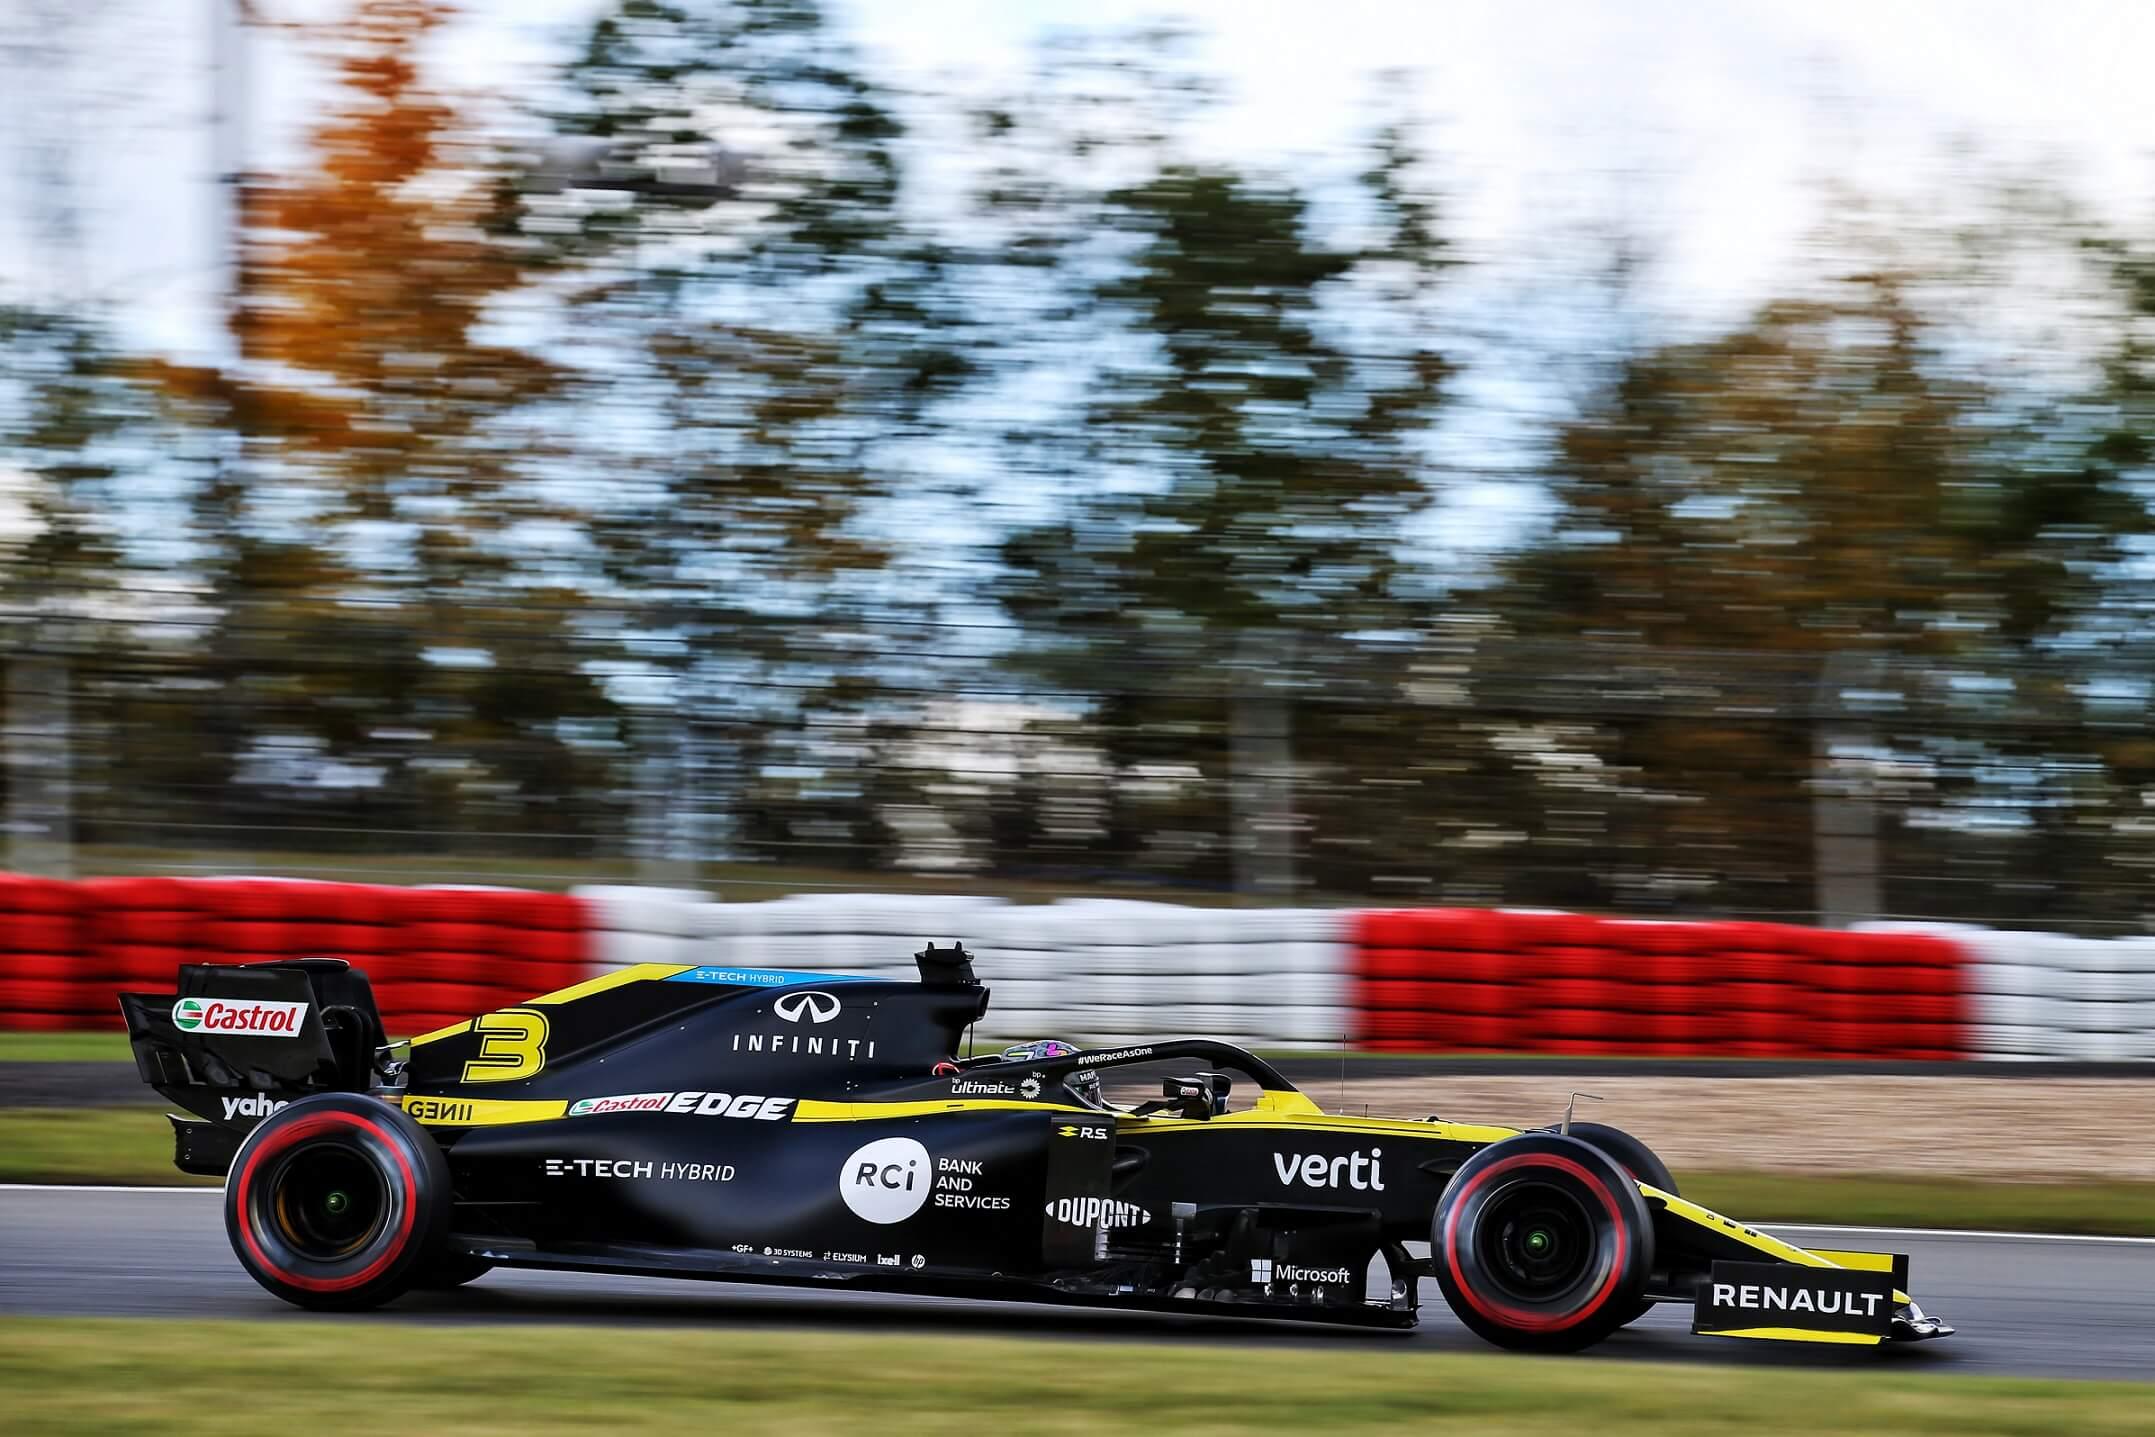 Renault DP F1 Team